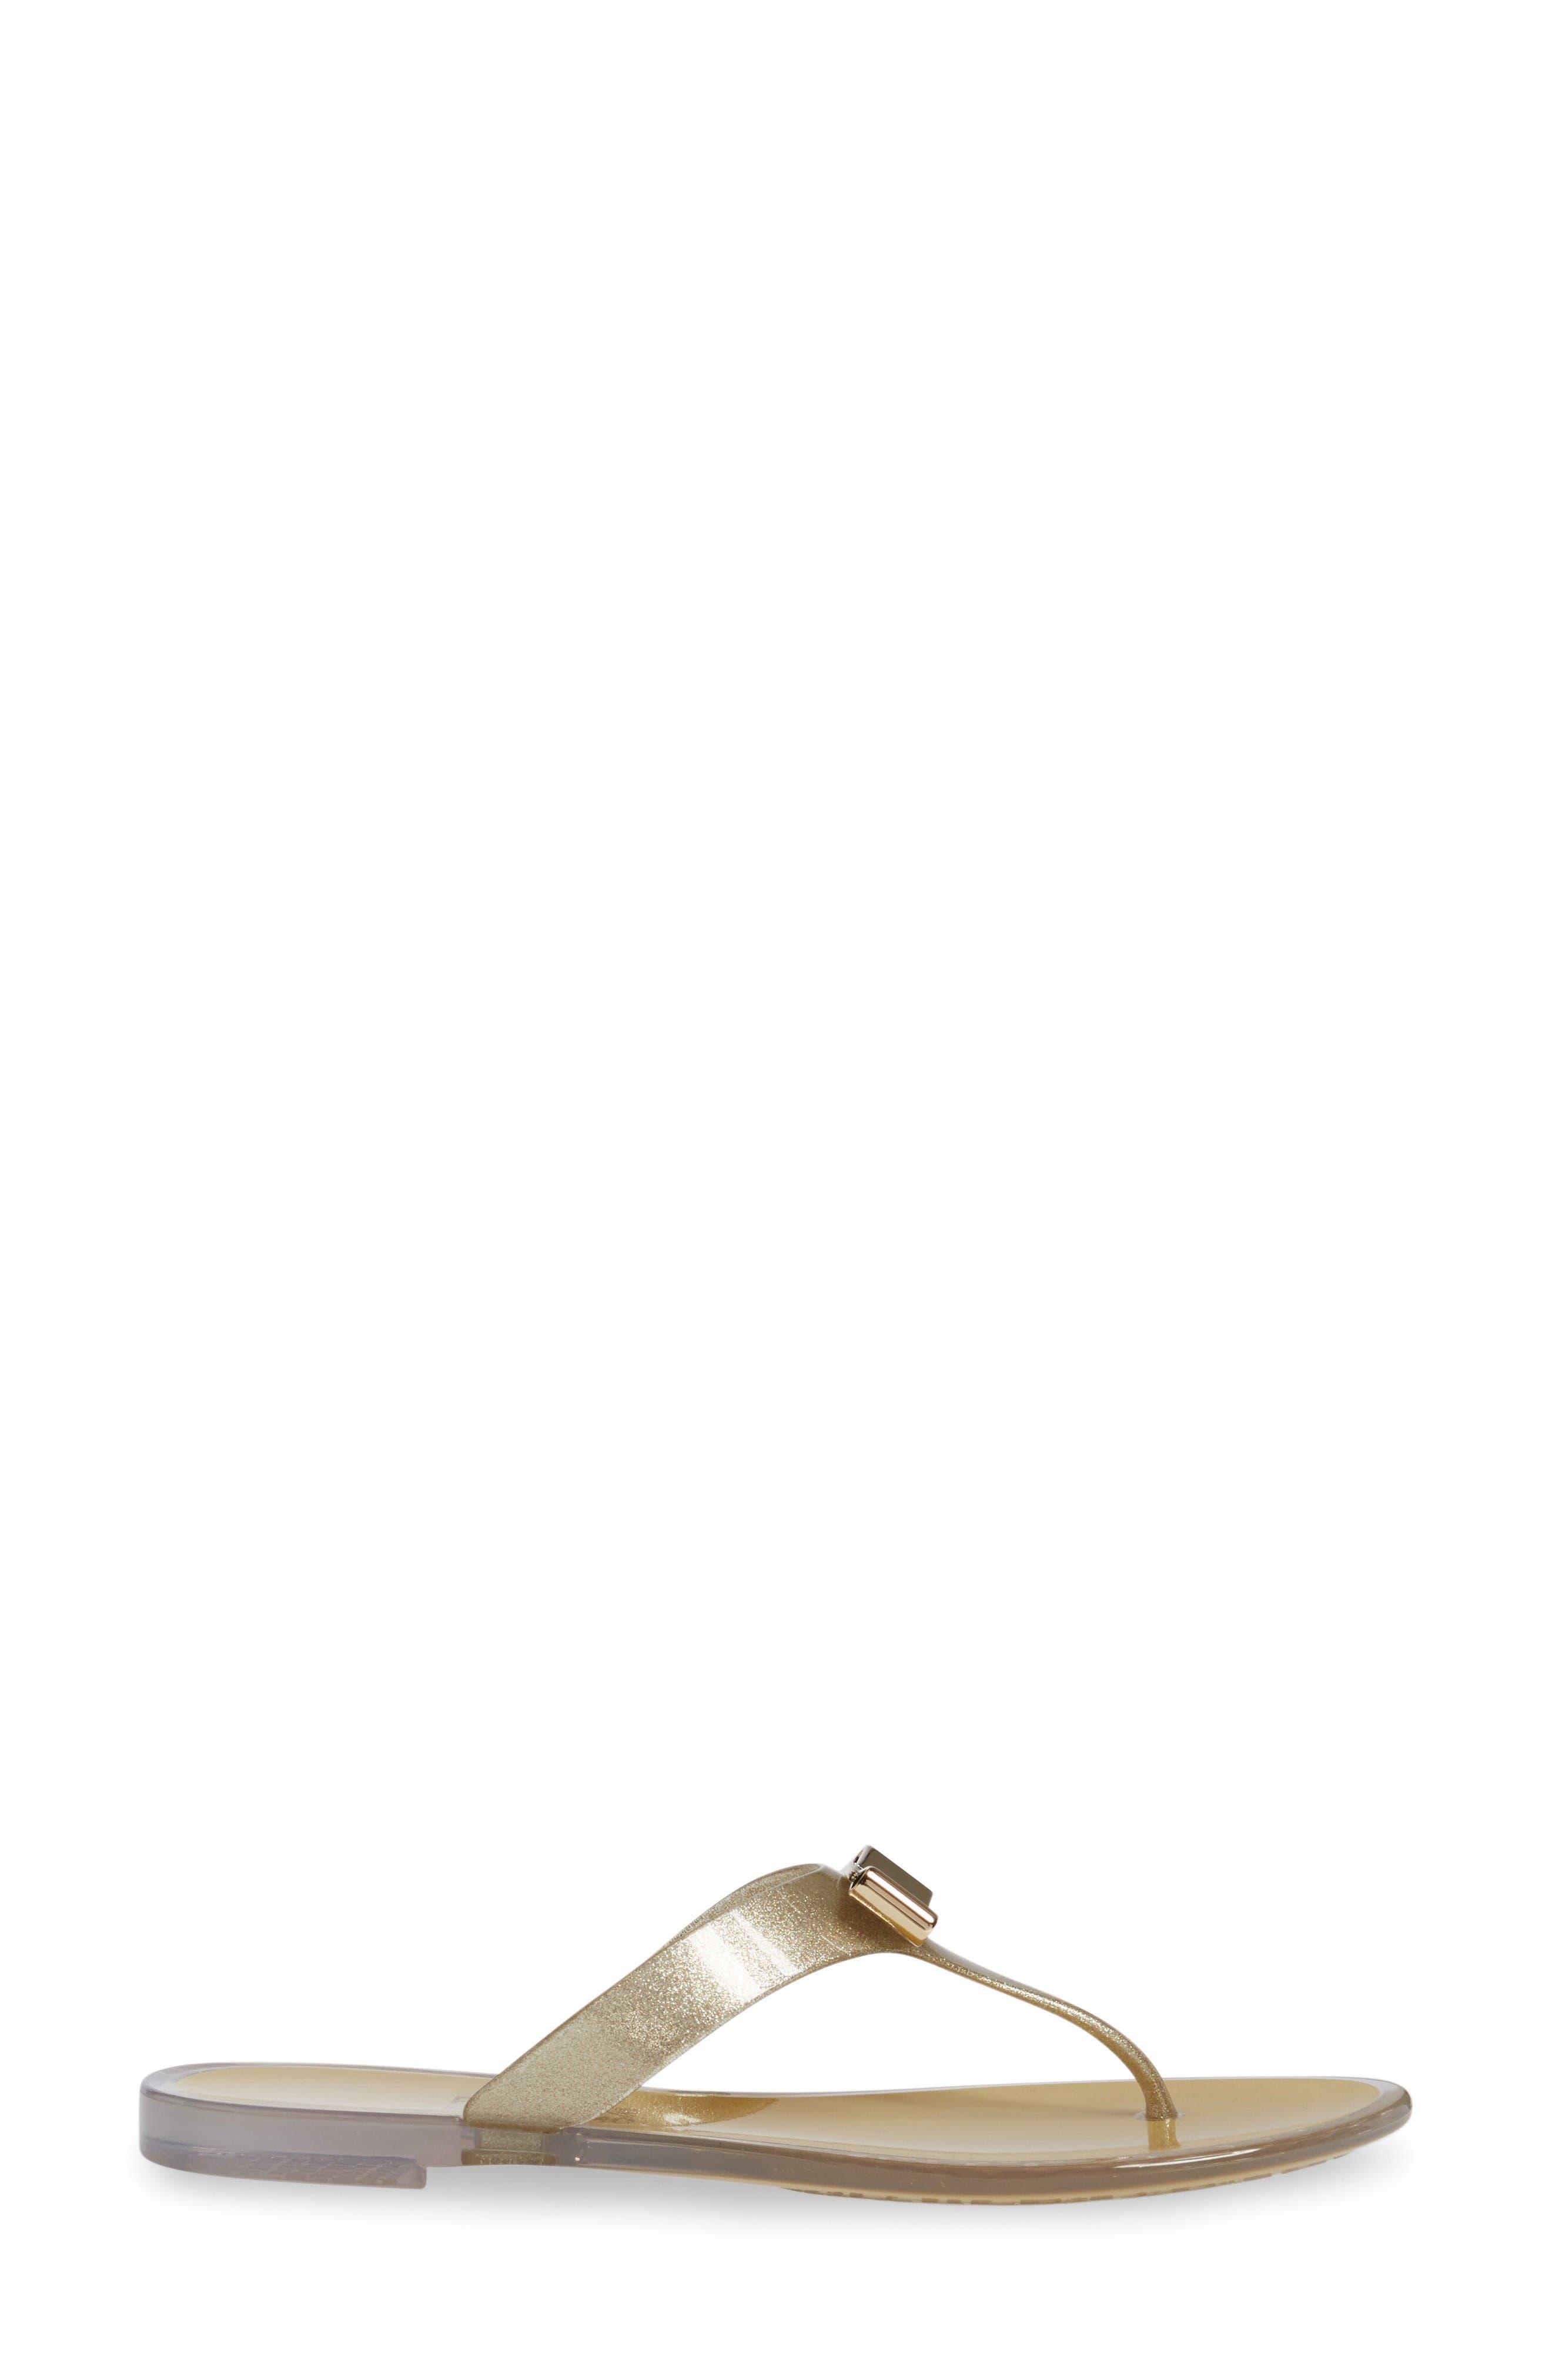 Jelly Flat Bow Sandal,                             Alternate thumbnail 4, color,                             Beige Glitter Pvc